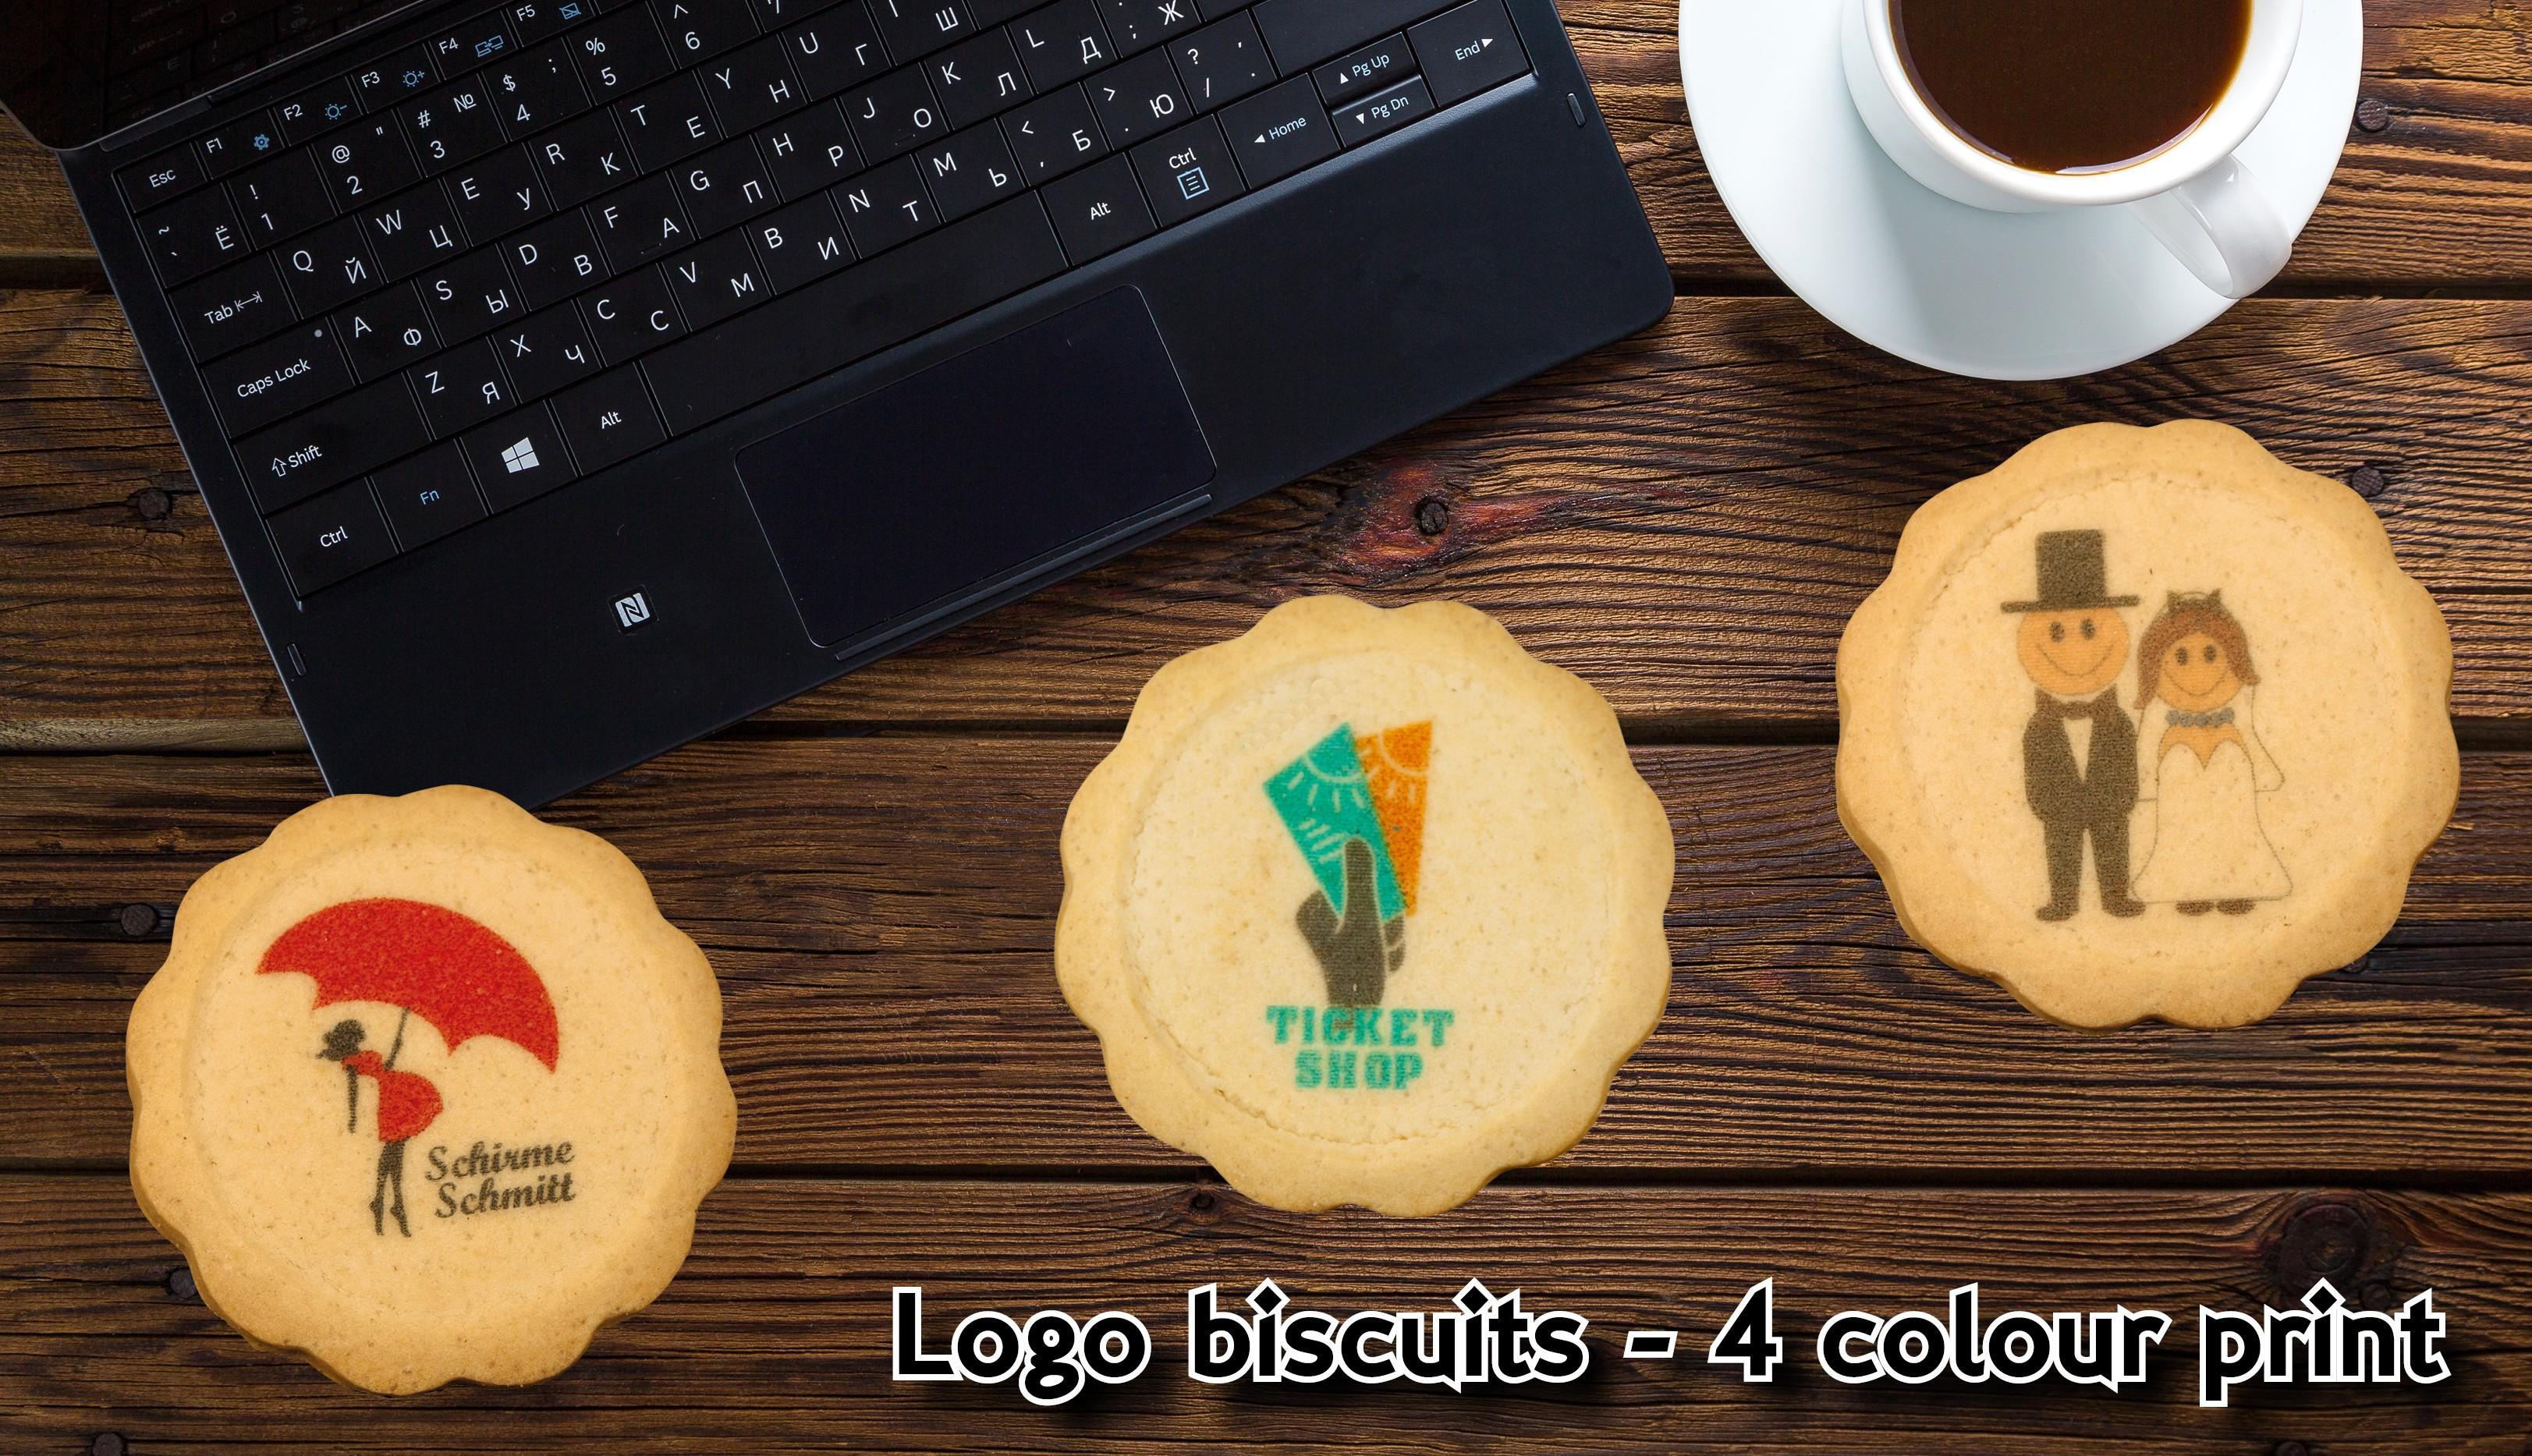 Logobiscuits